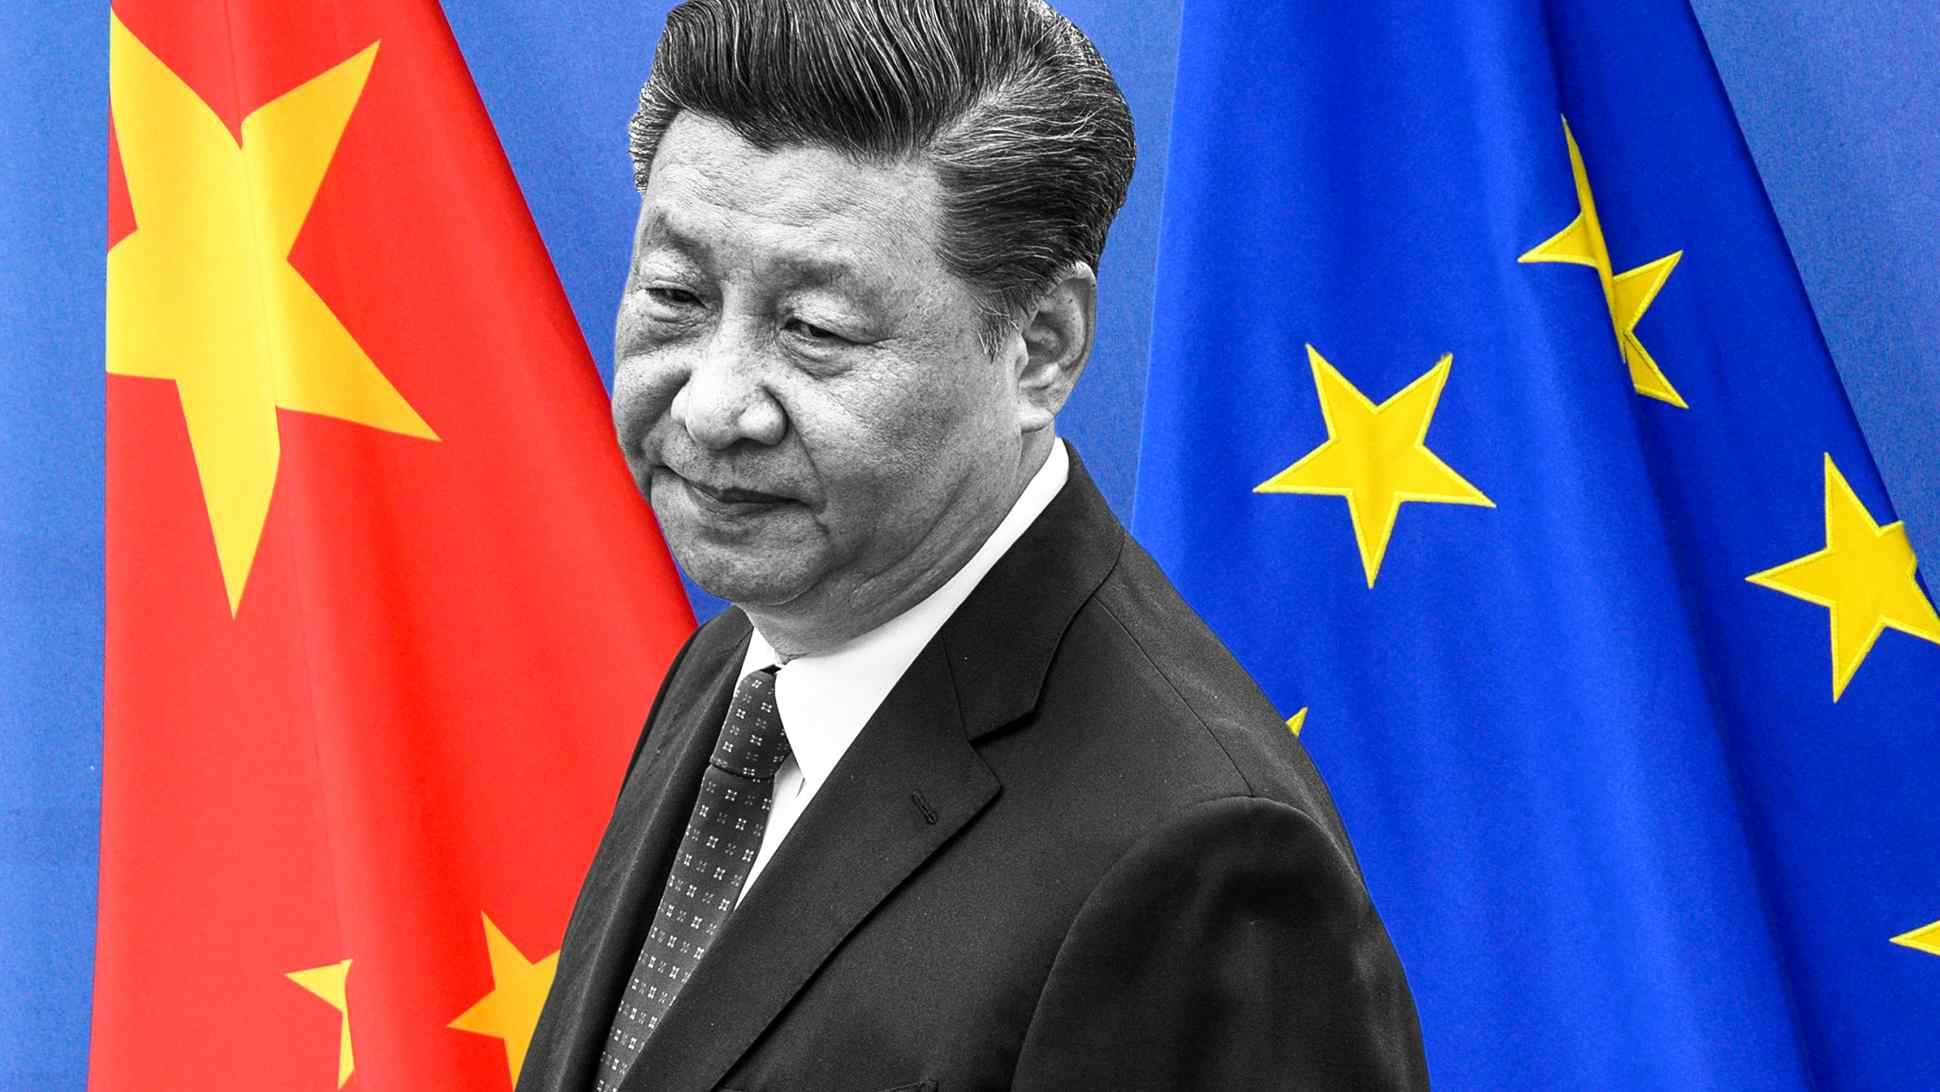 Analysis: China Loses Europe As Xi's Hard-Line Diplomacy Backfires